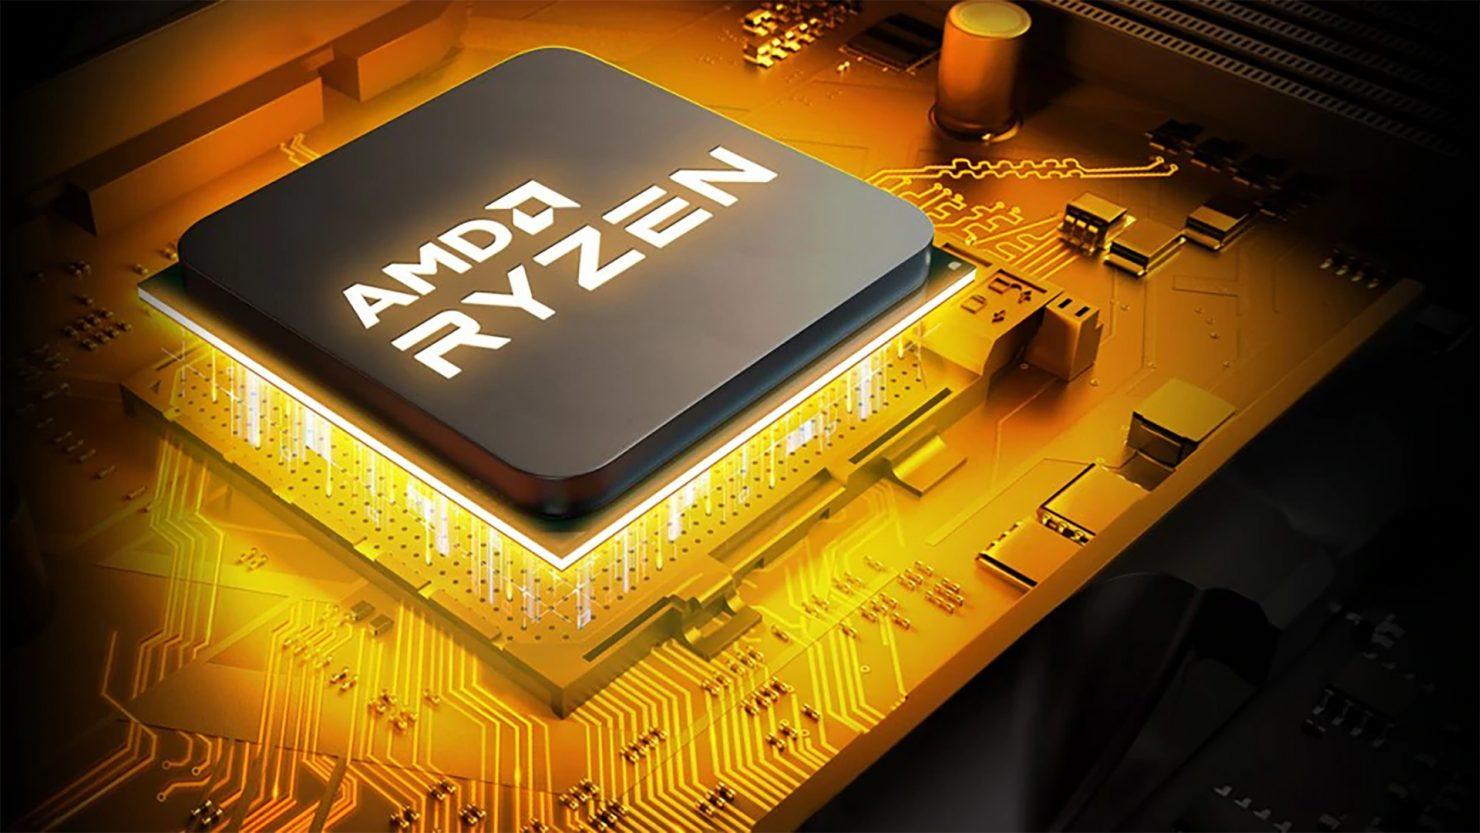 amd-am5-next-gen-desktop-platform-details-leak-out-–-zen-4-ryzen-cpu-support,-lga-1718-socket,-dual-channel-ddr5-memory